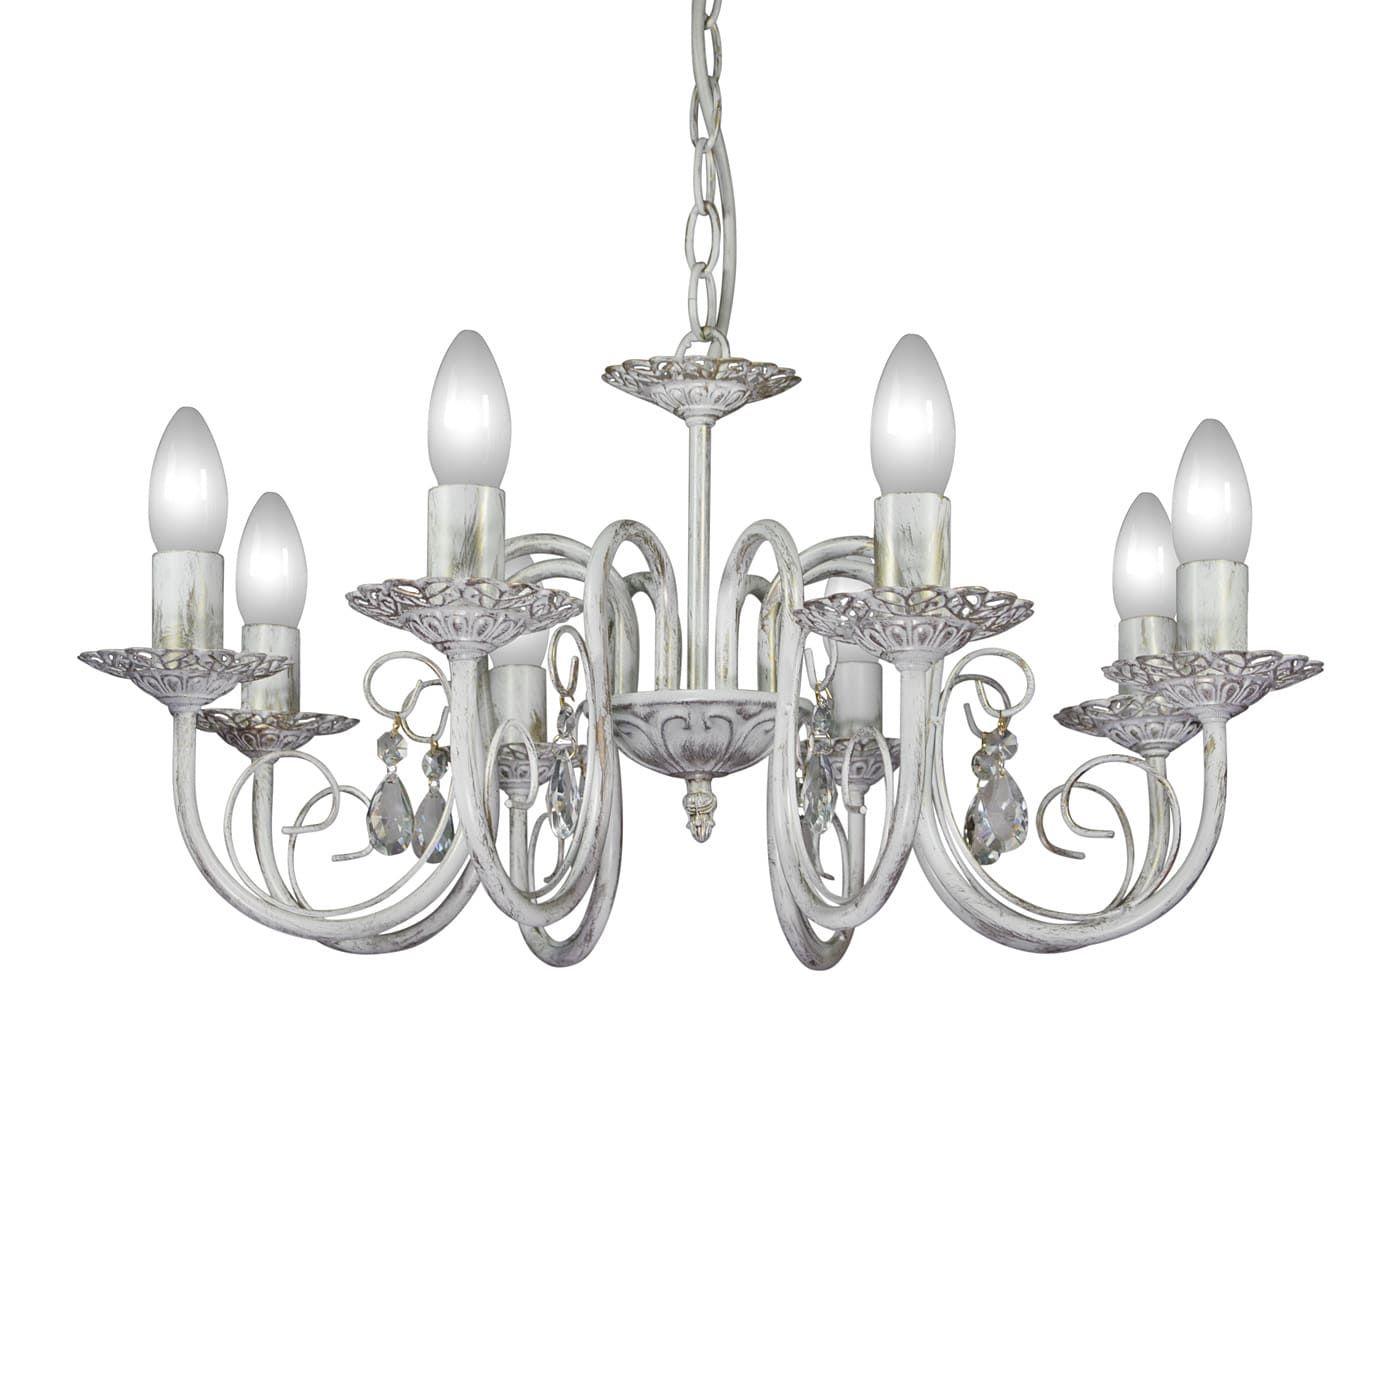 PETRASVET / Pendant chandelier S1170-8, 8xE14 max. 60W